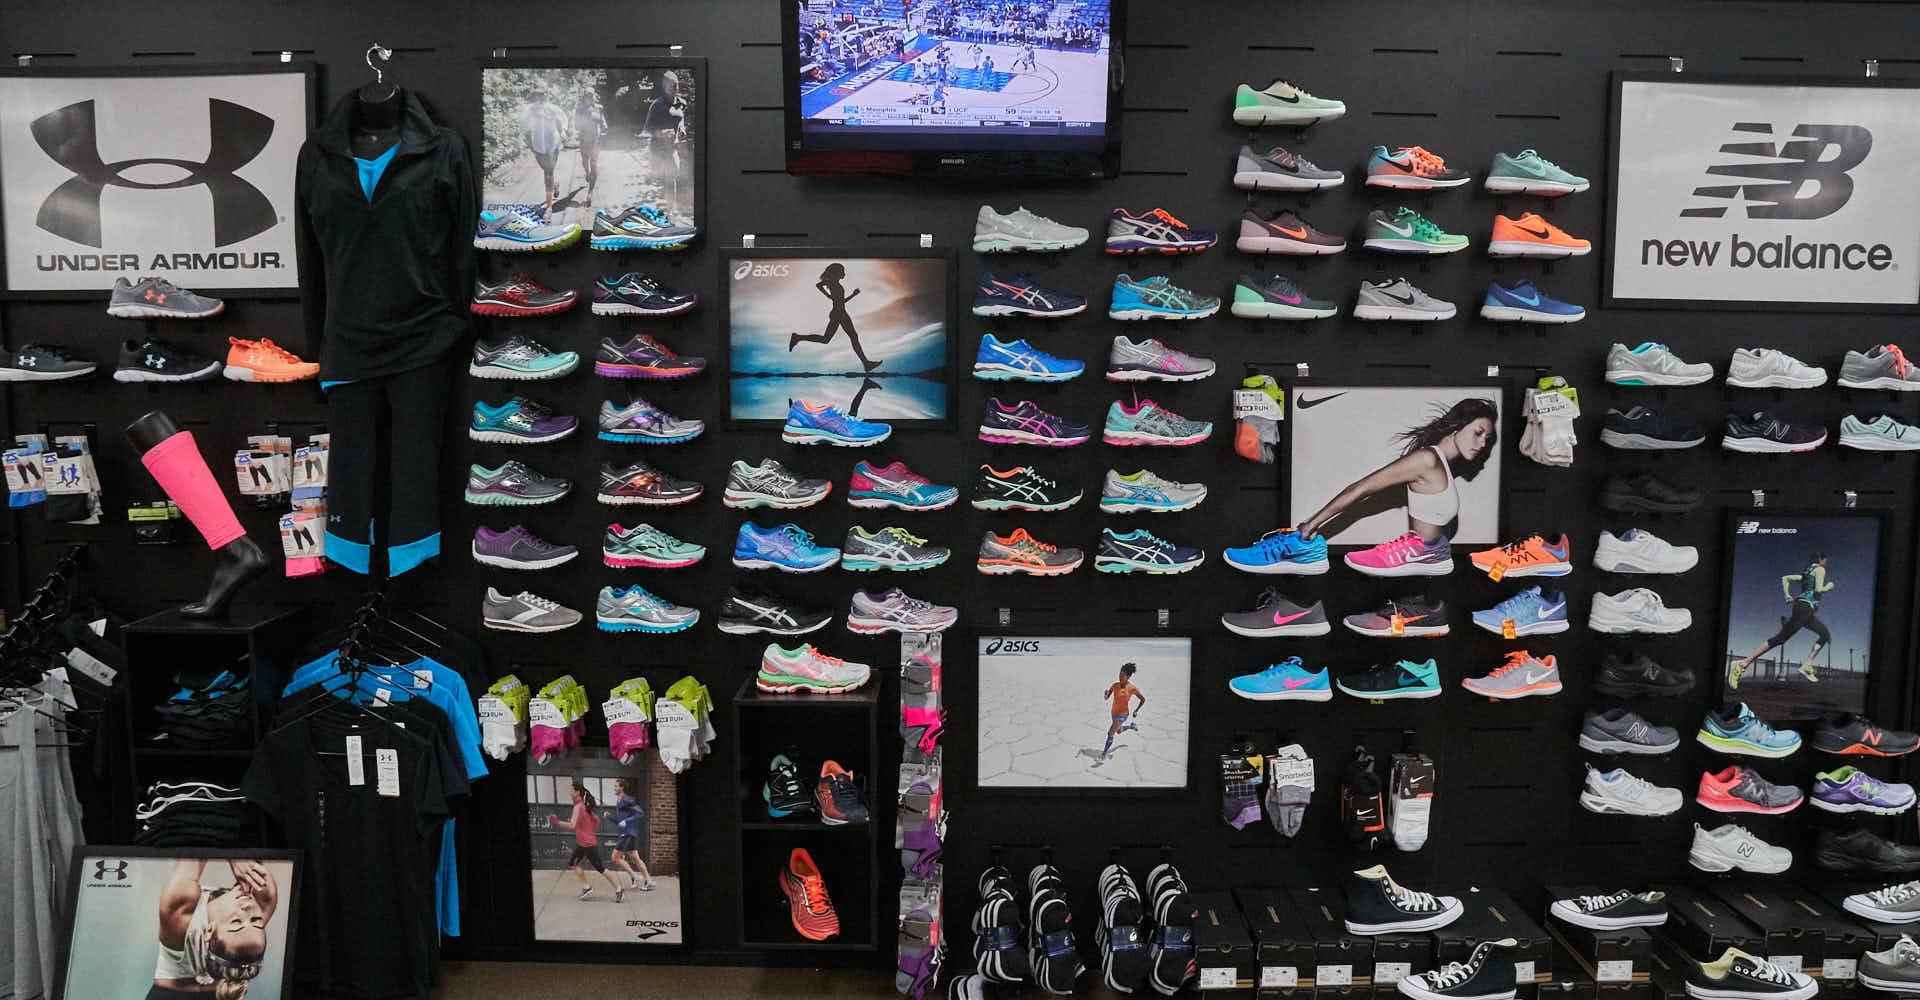 Atlantic shoe store 134